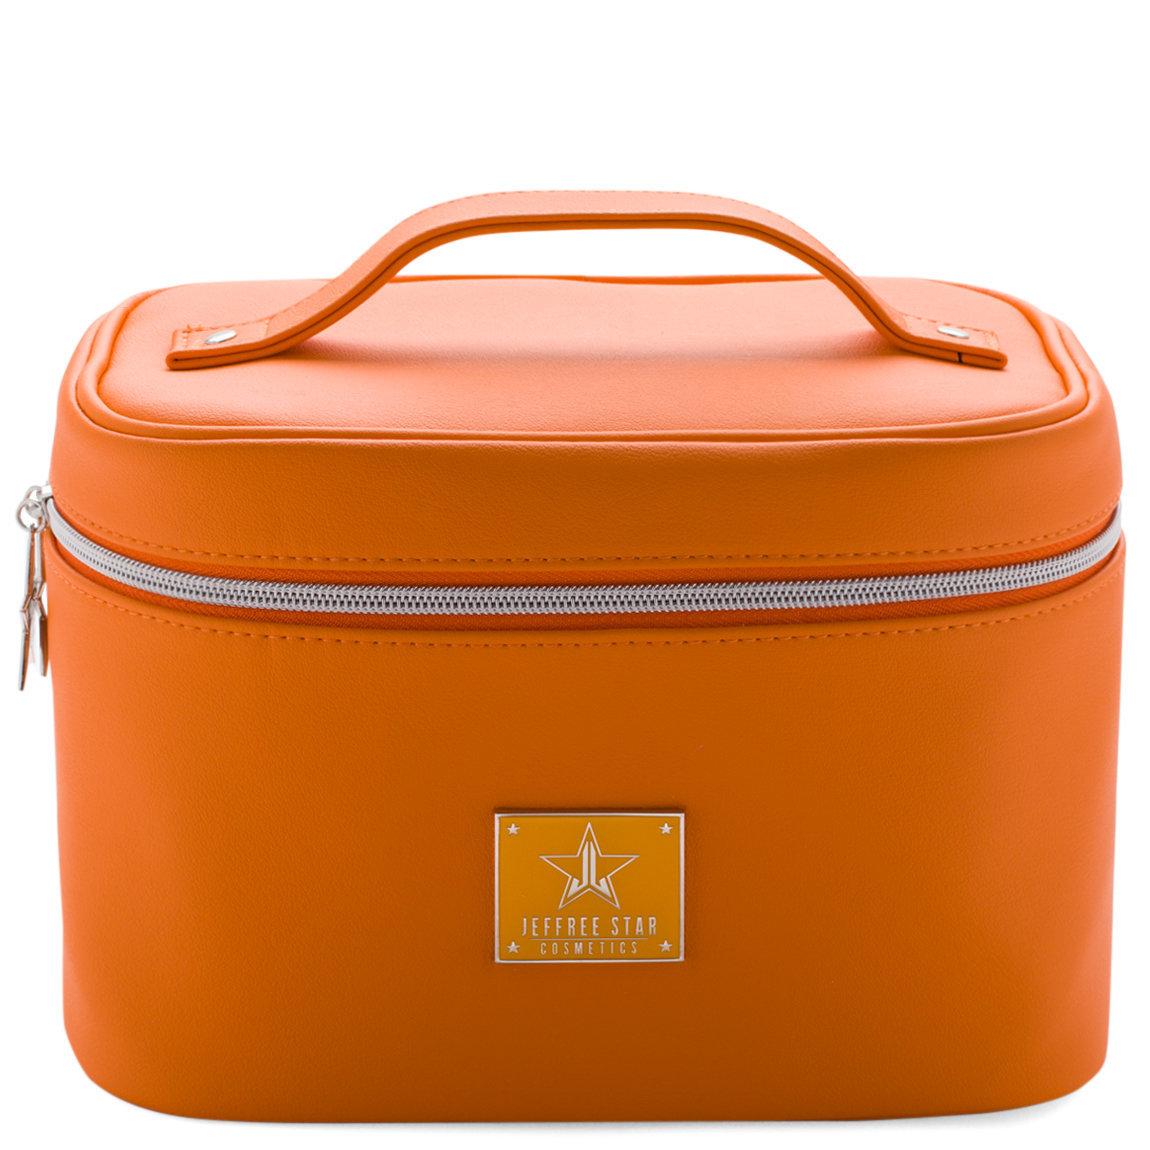 Jeffree Star Cosmetics Travel Makeup Bag Orange product smear.